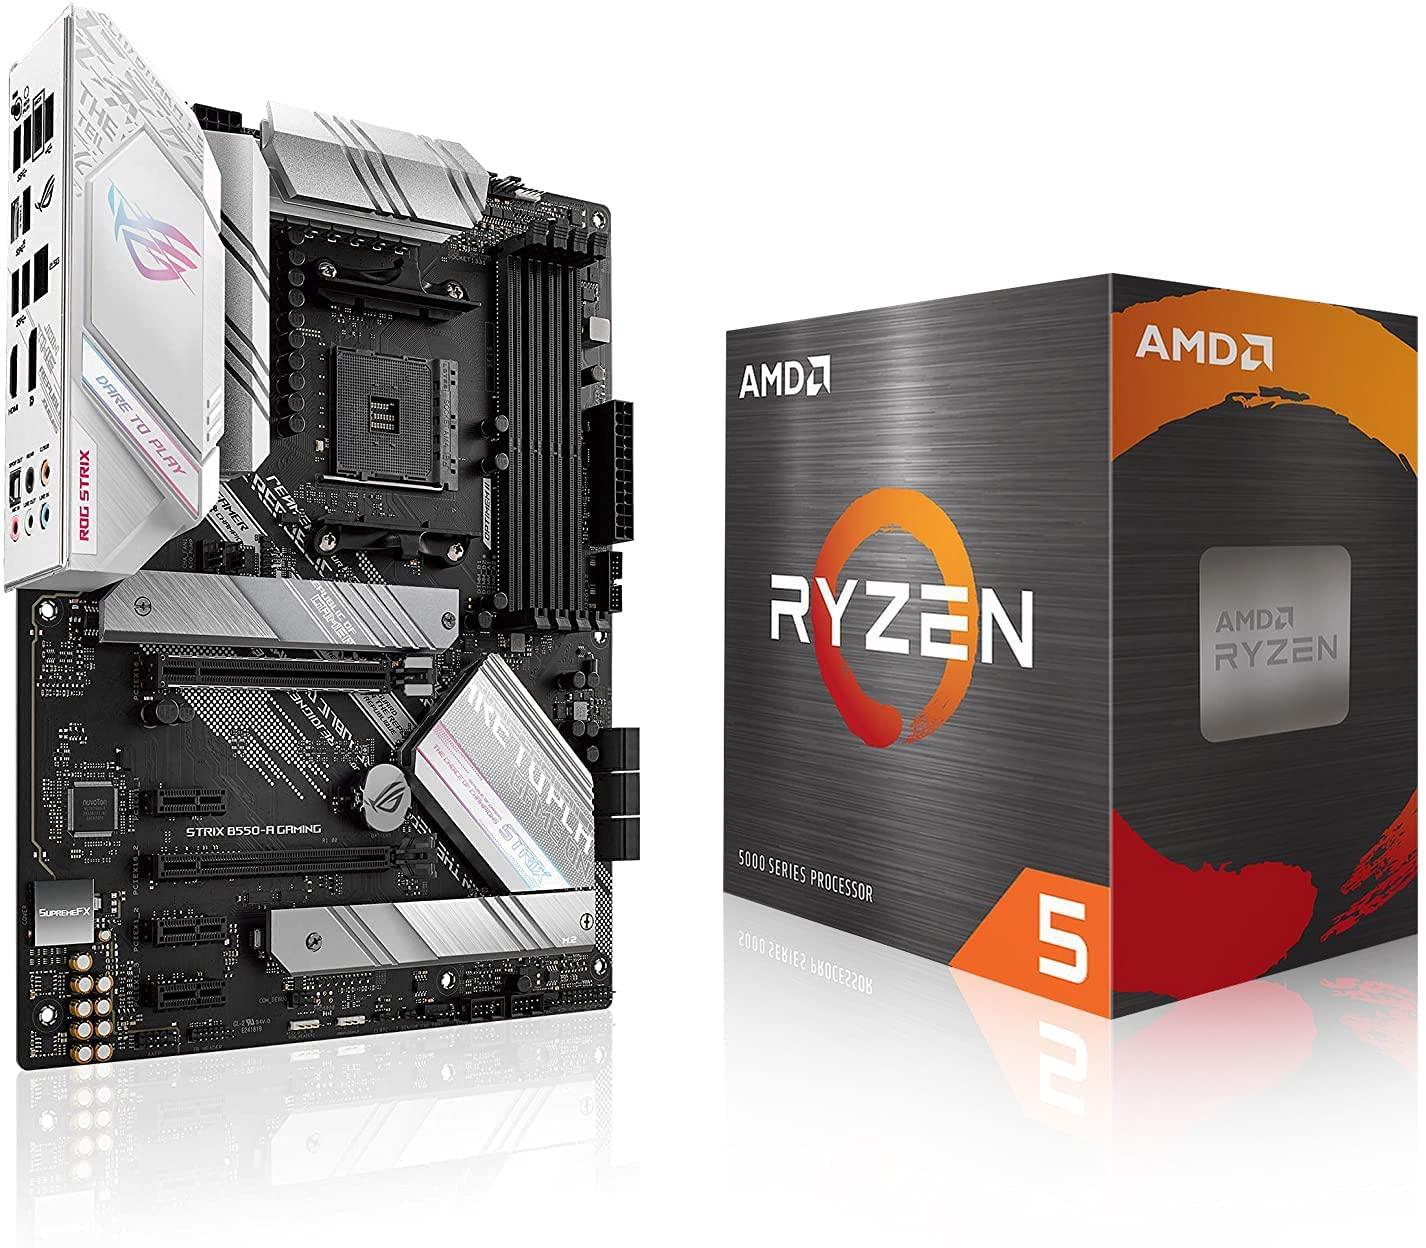 AMD Ryzen 5 5600X + ASUS Gaming B550 + Motherboard